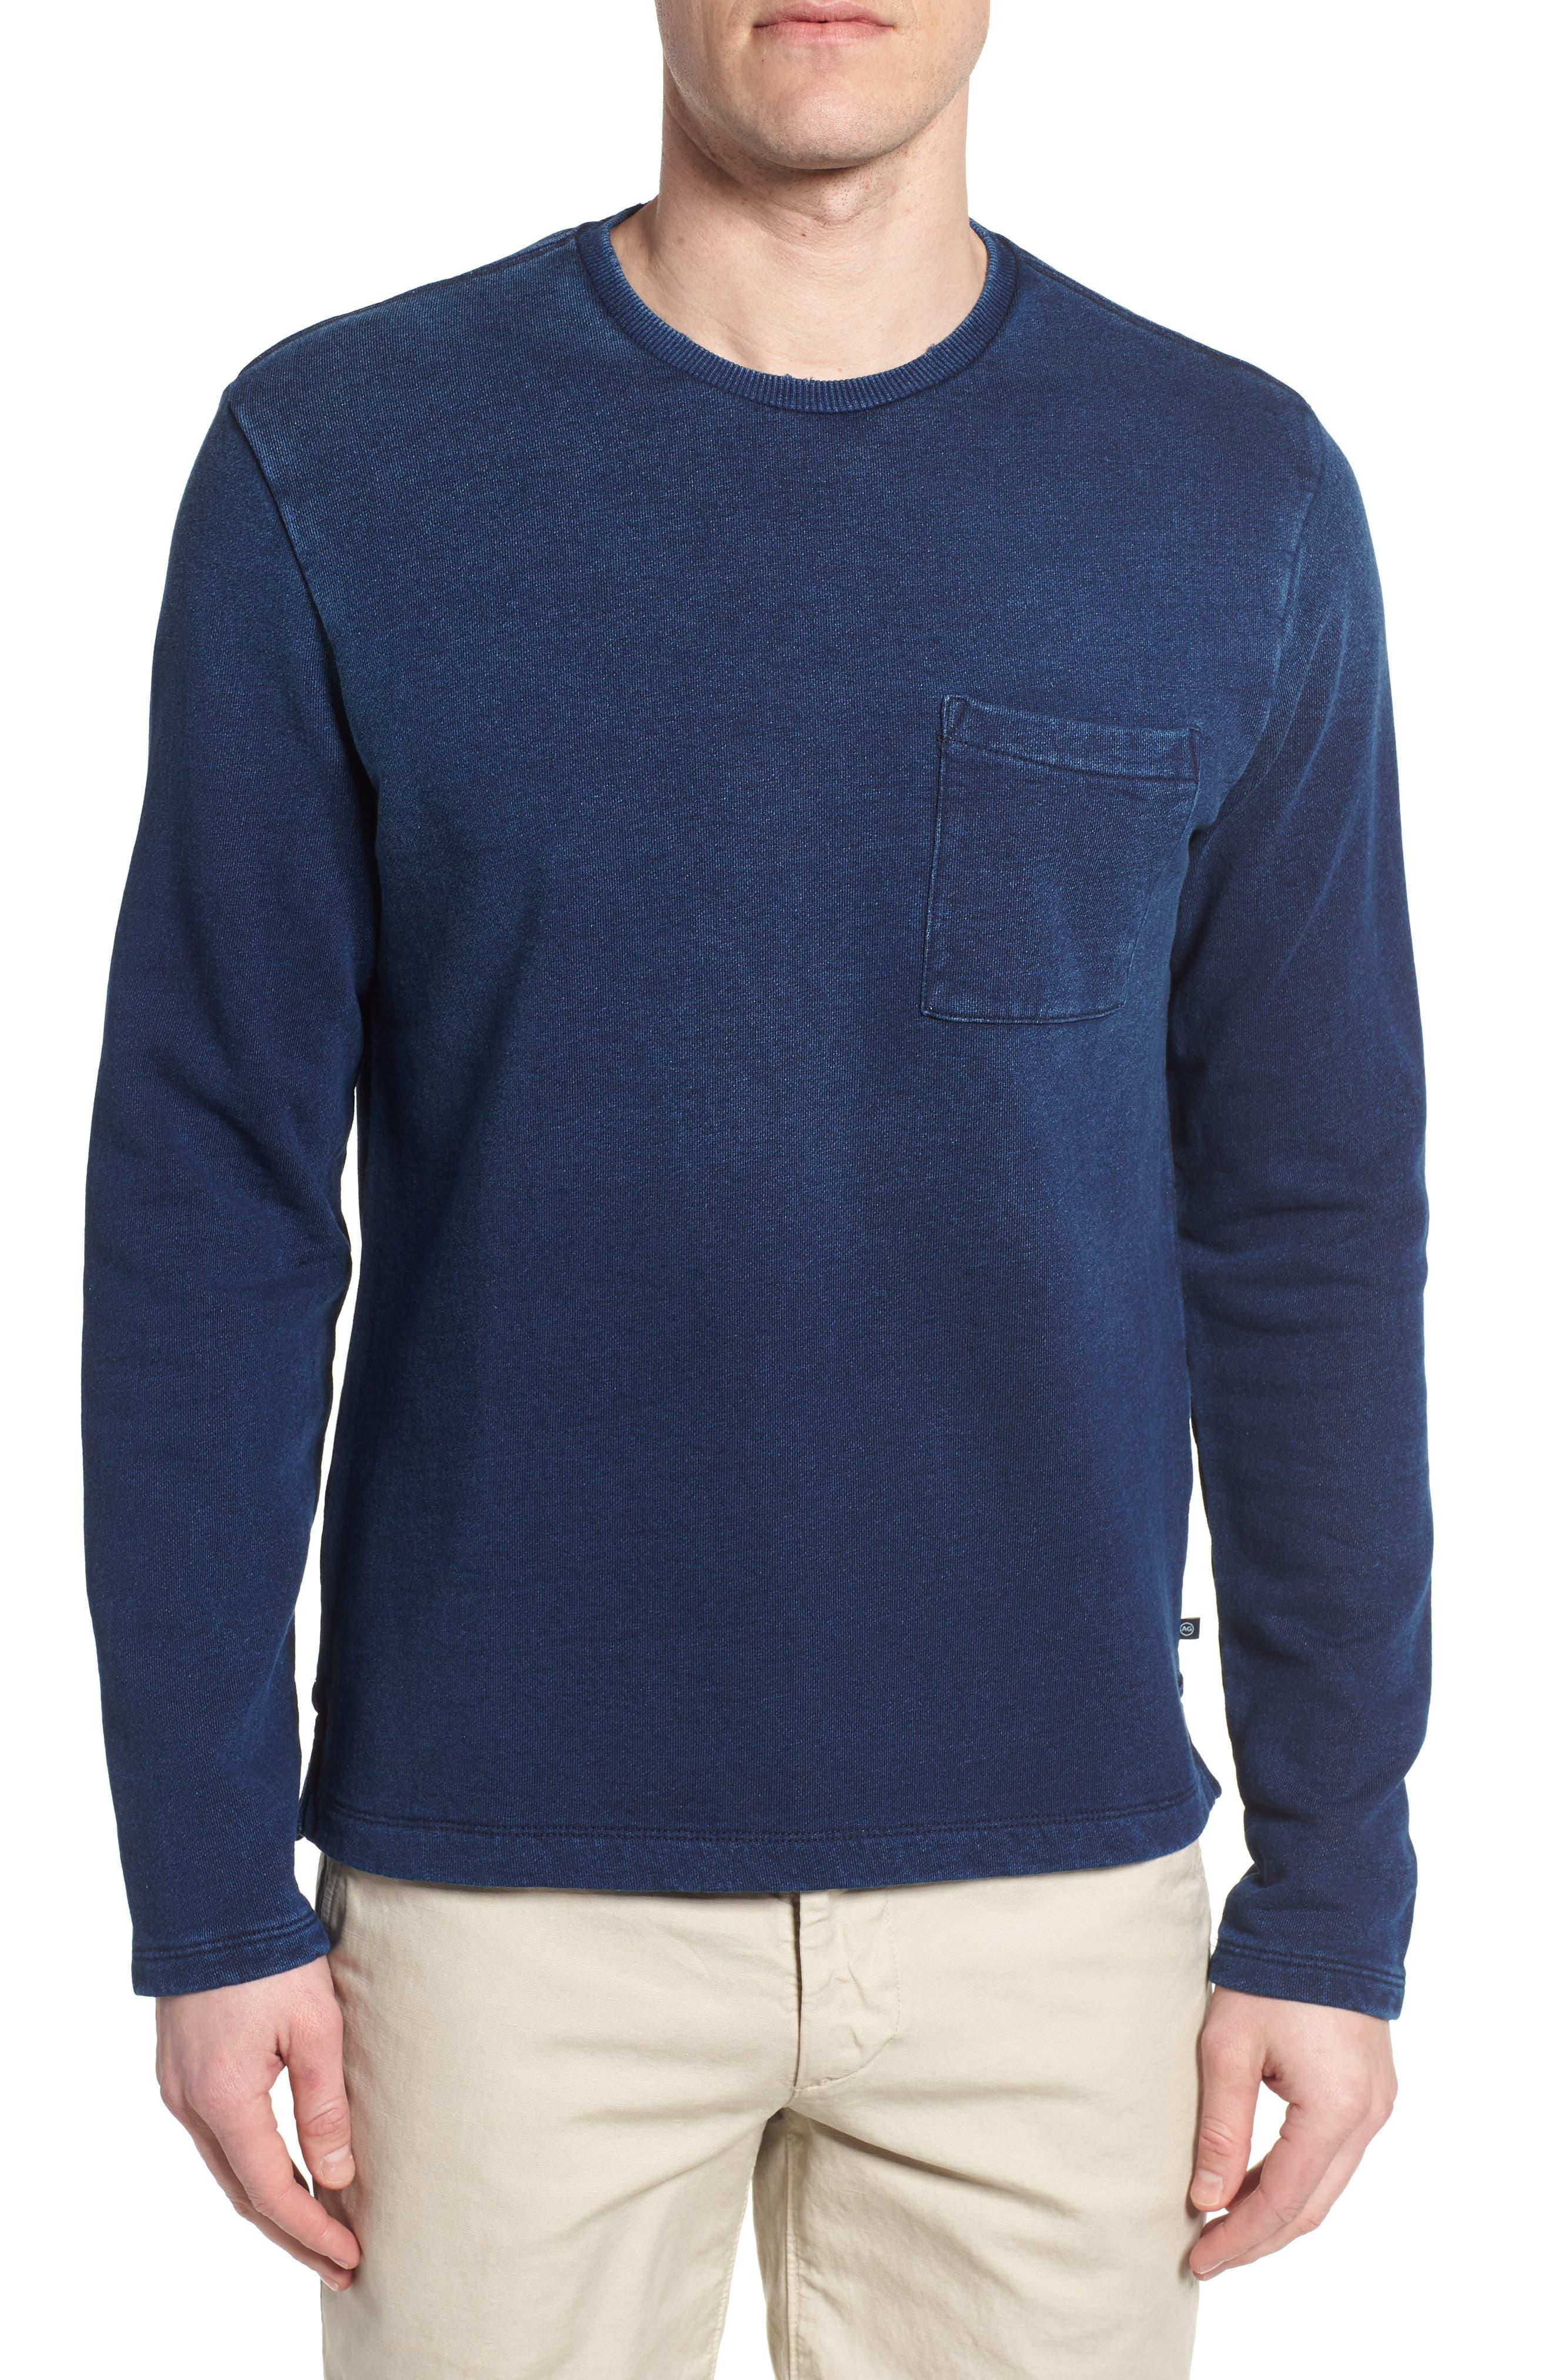 AG Byron Crewneck Cotton Pocket Sweatshirt